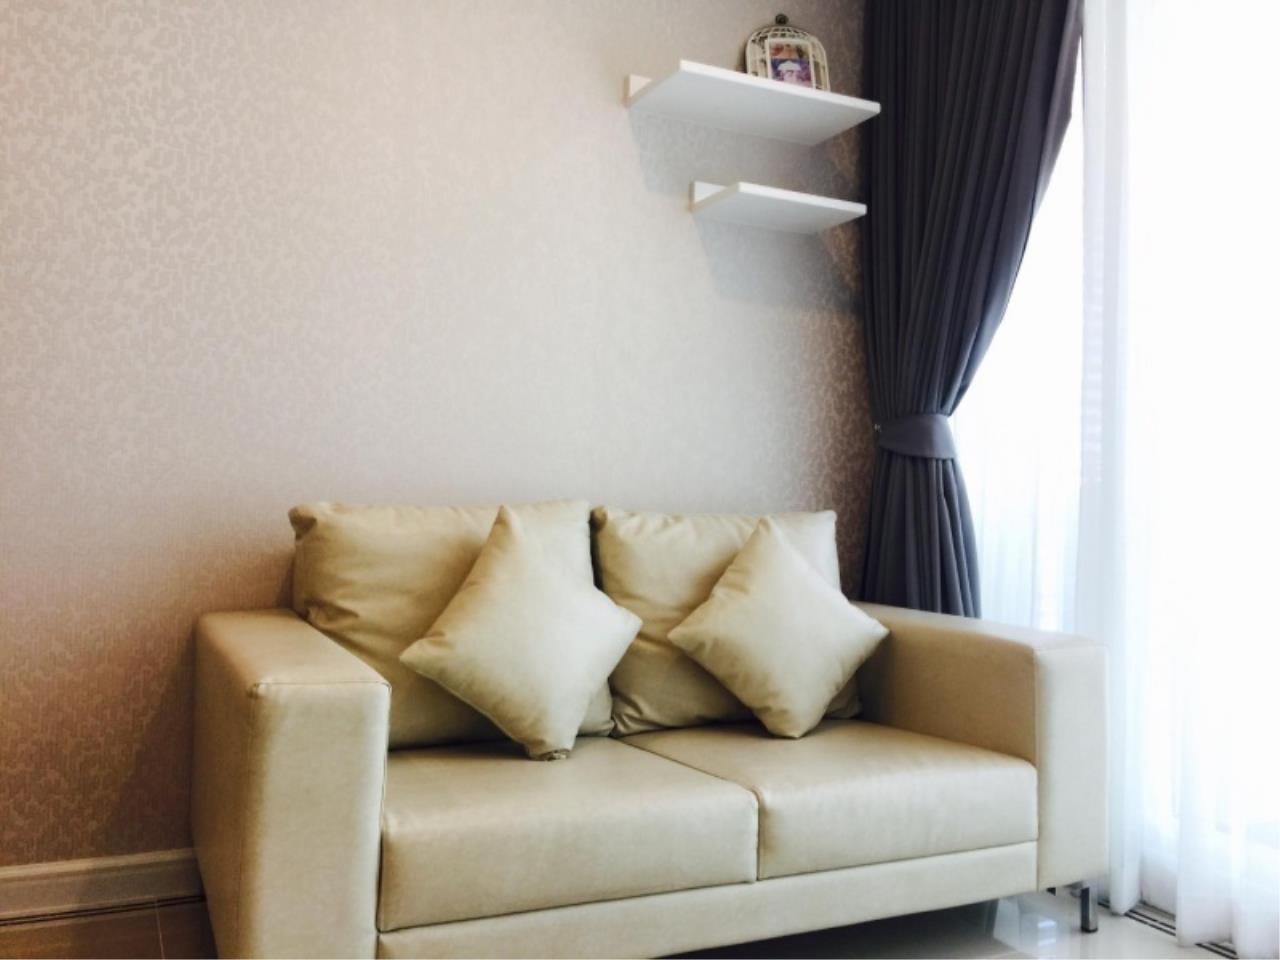 Century21 Skylux Agency's T.C. Green / Condo For Sale / 1 Bedroom / 35 SQM / MRT Phra Ram 9 / Bangkok 3